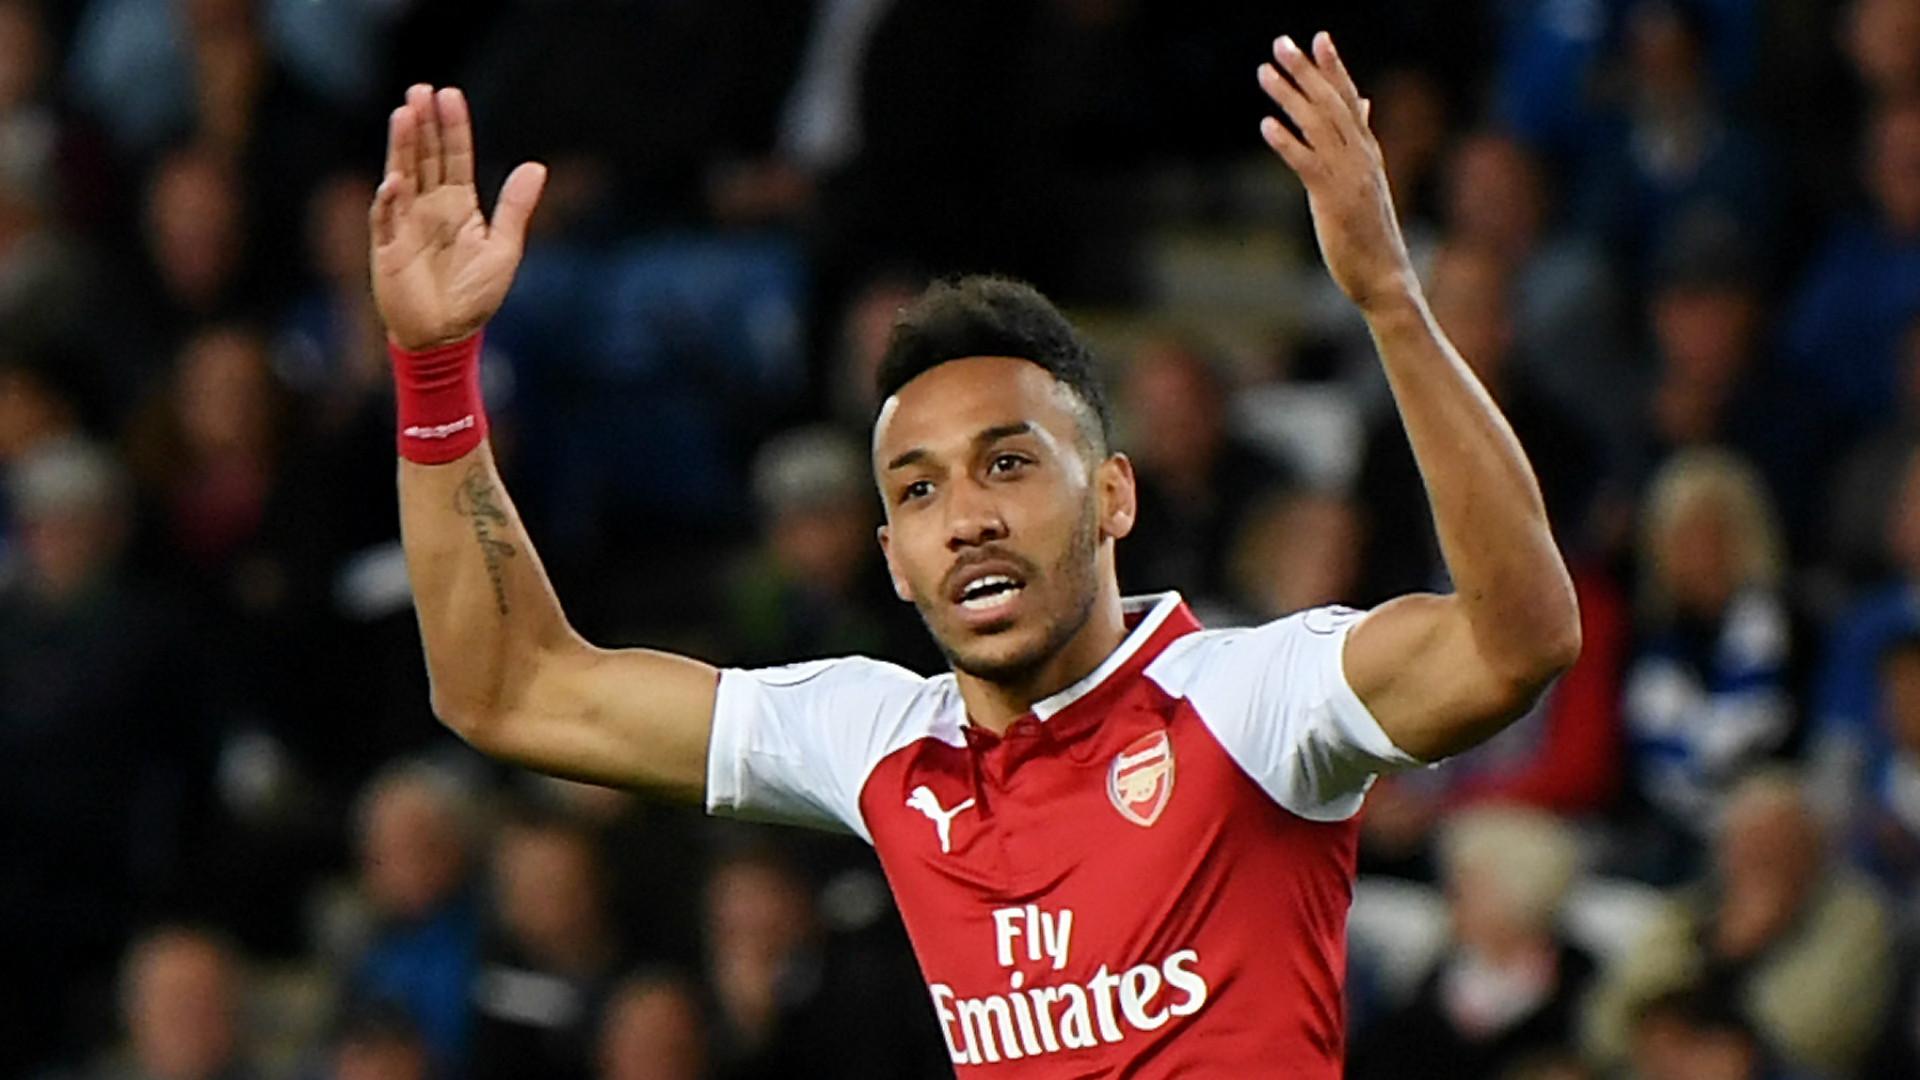 Arsenal sign Premier League's biggest sleeve sponsor deal